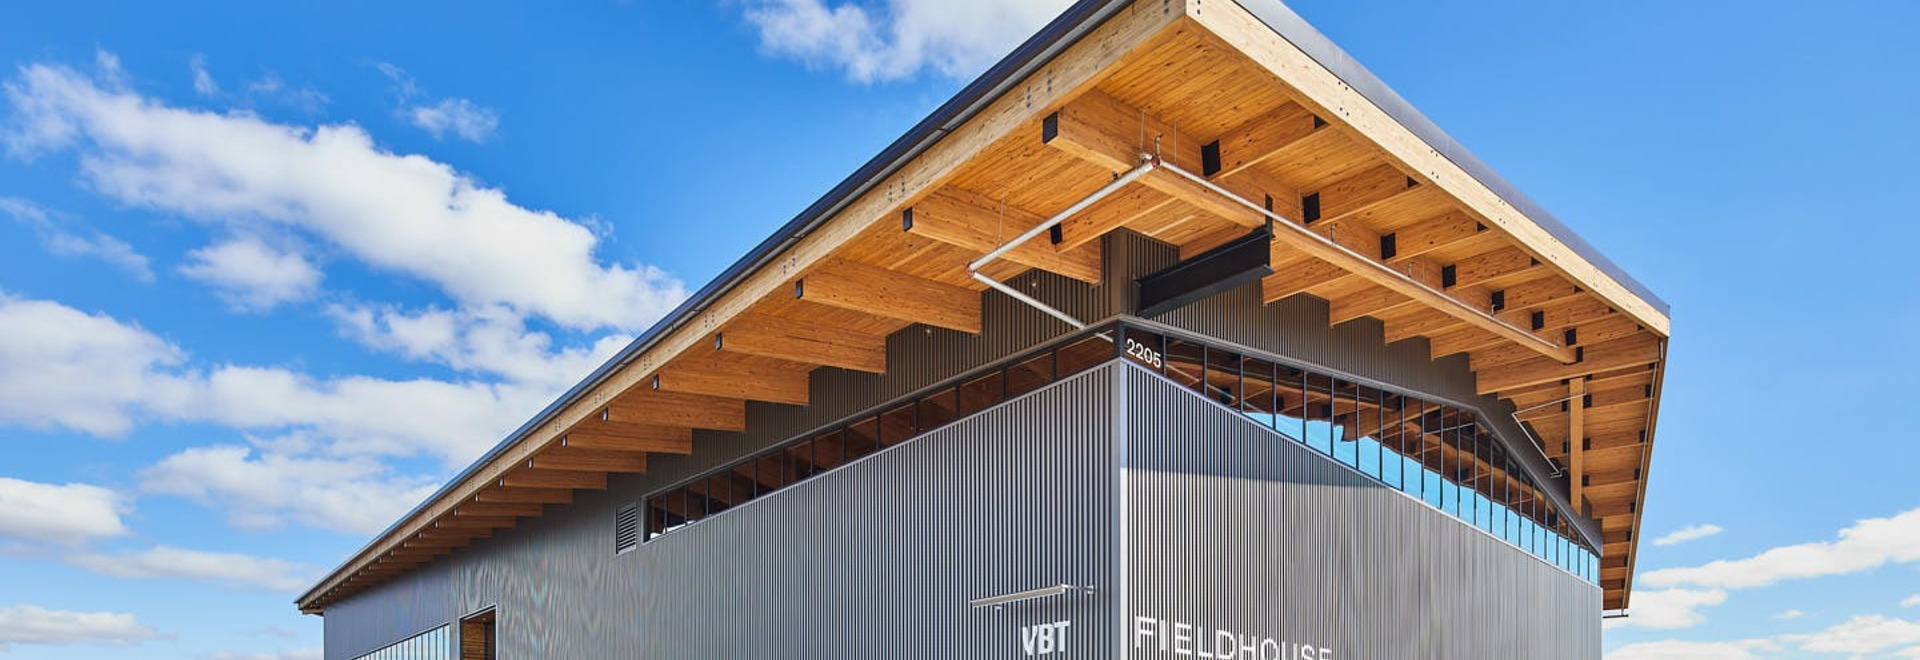 Thaden Fieldhouse